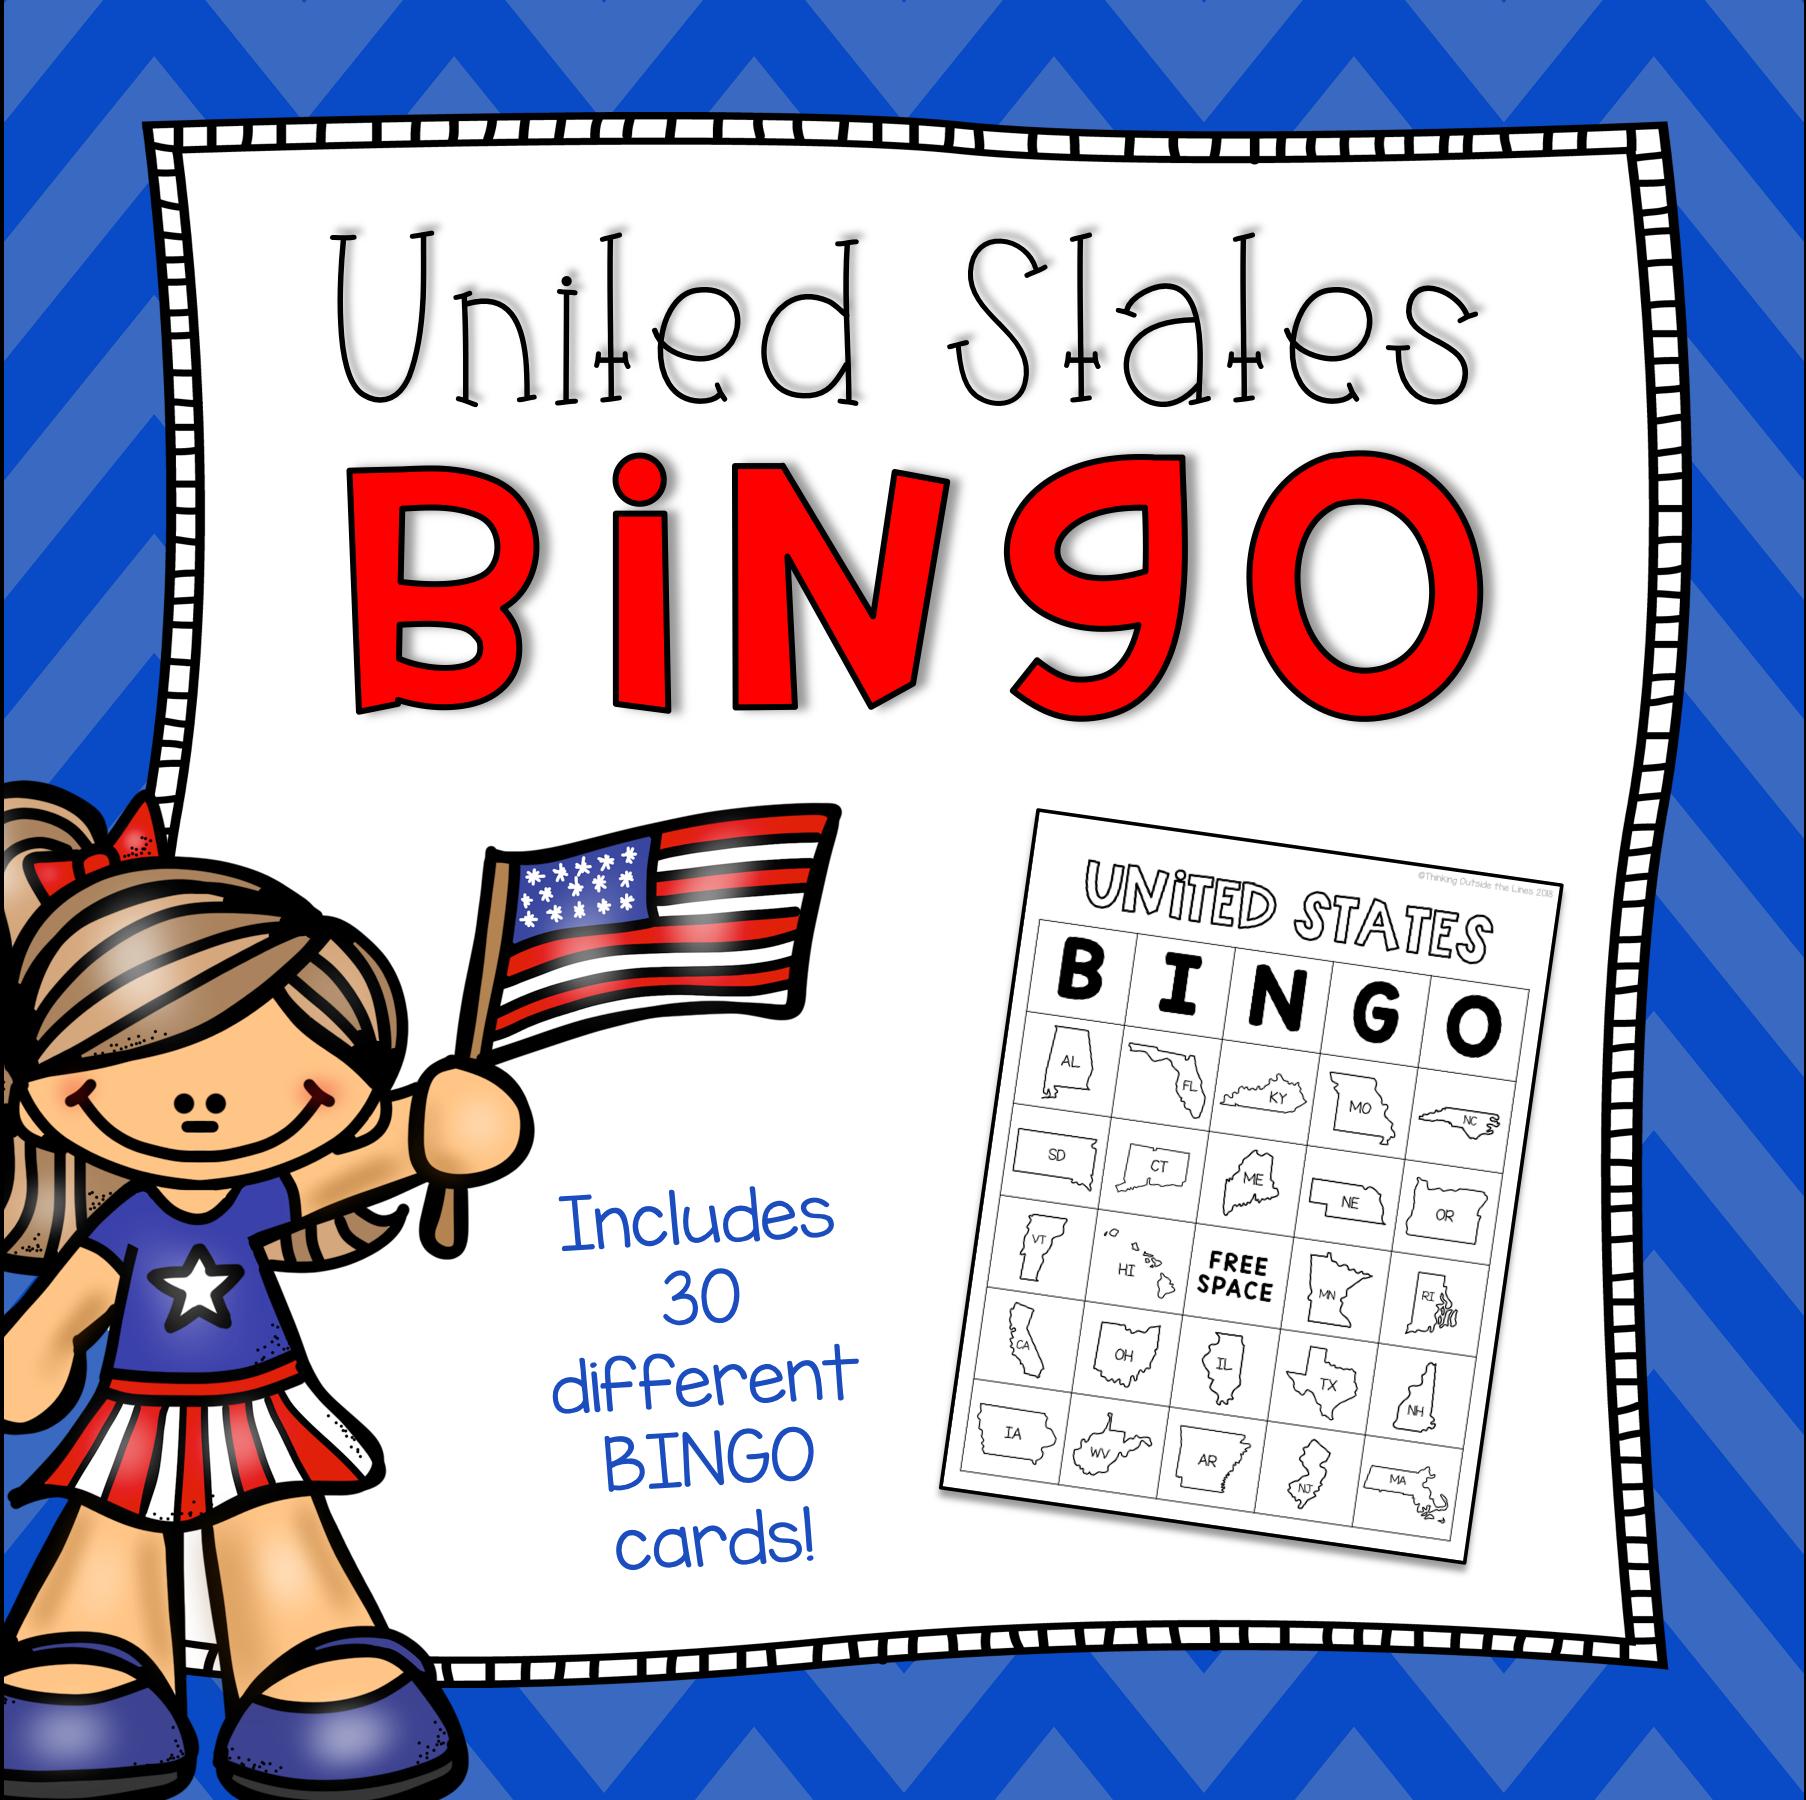 United States Bingo | Bingo, States, Capitals, Bingo Cards